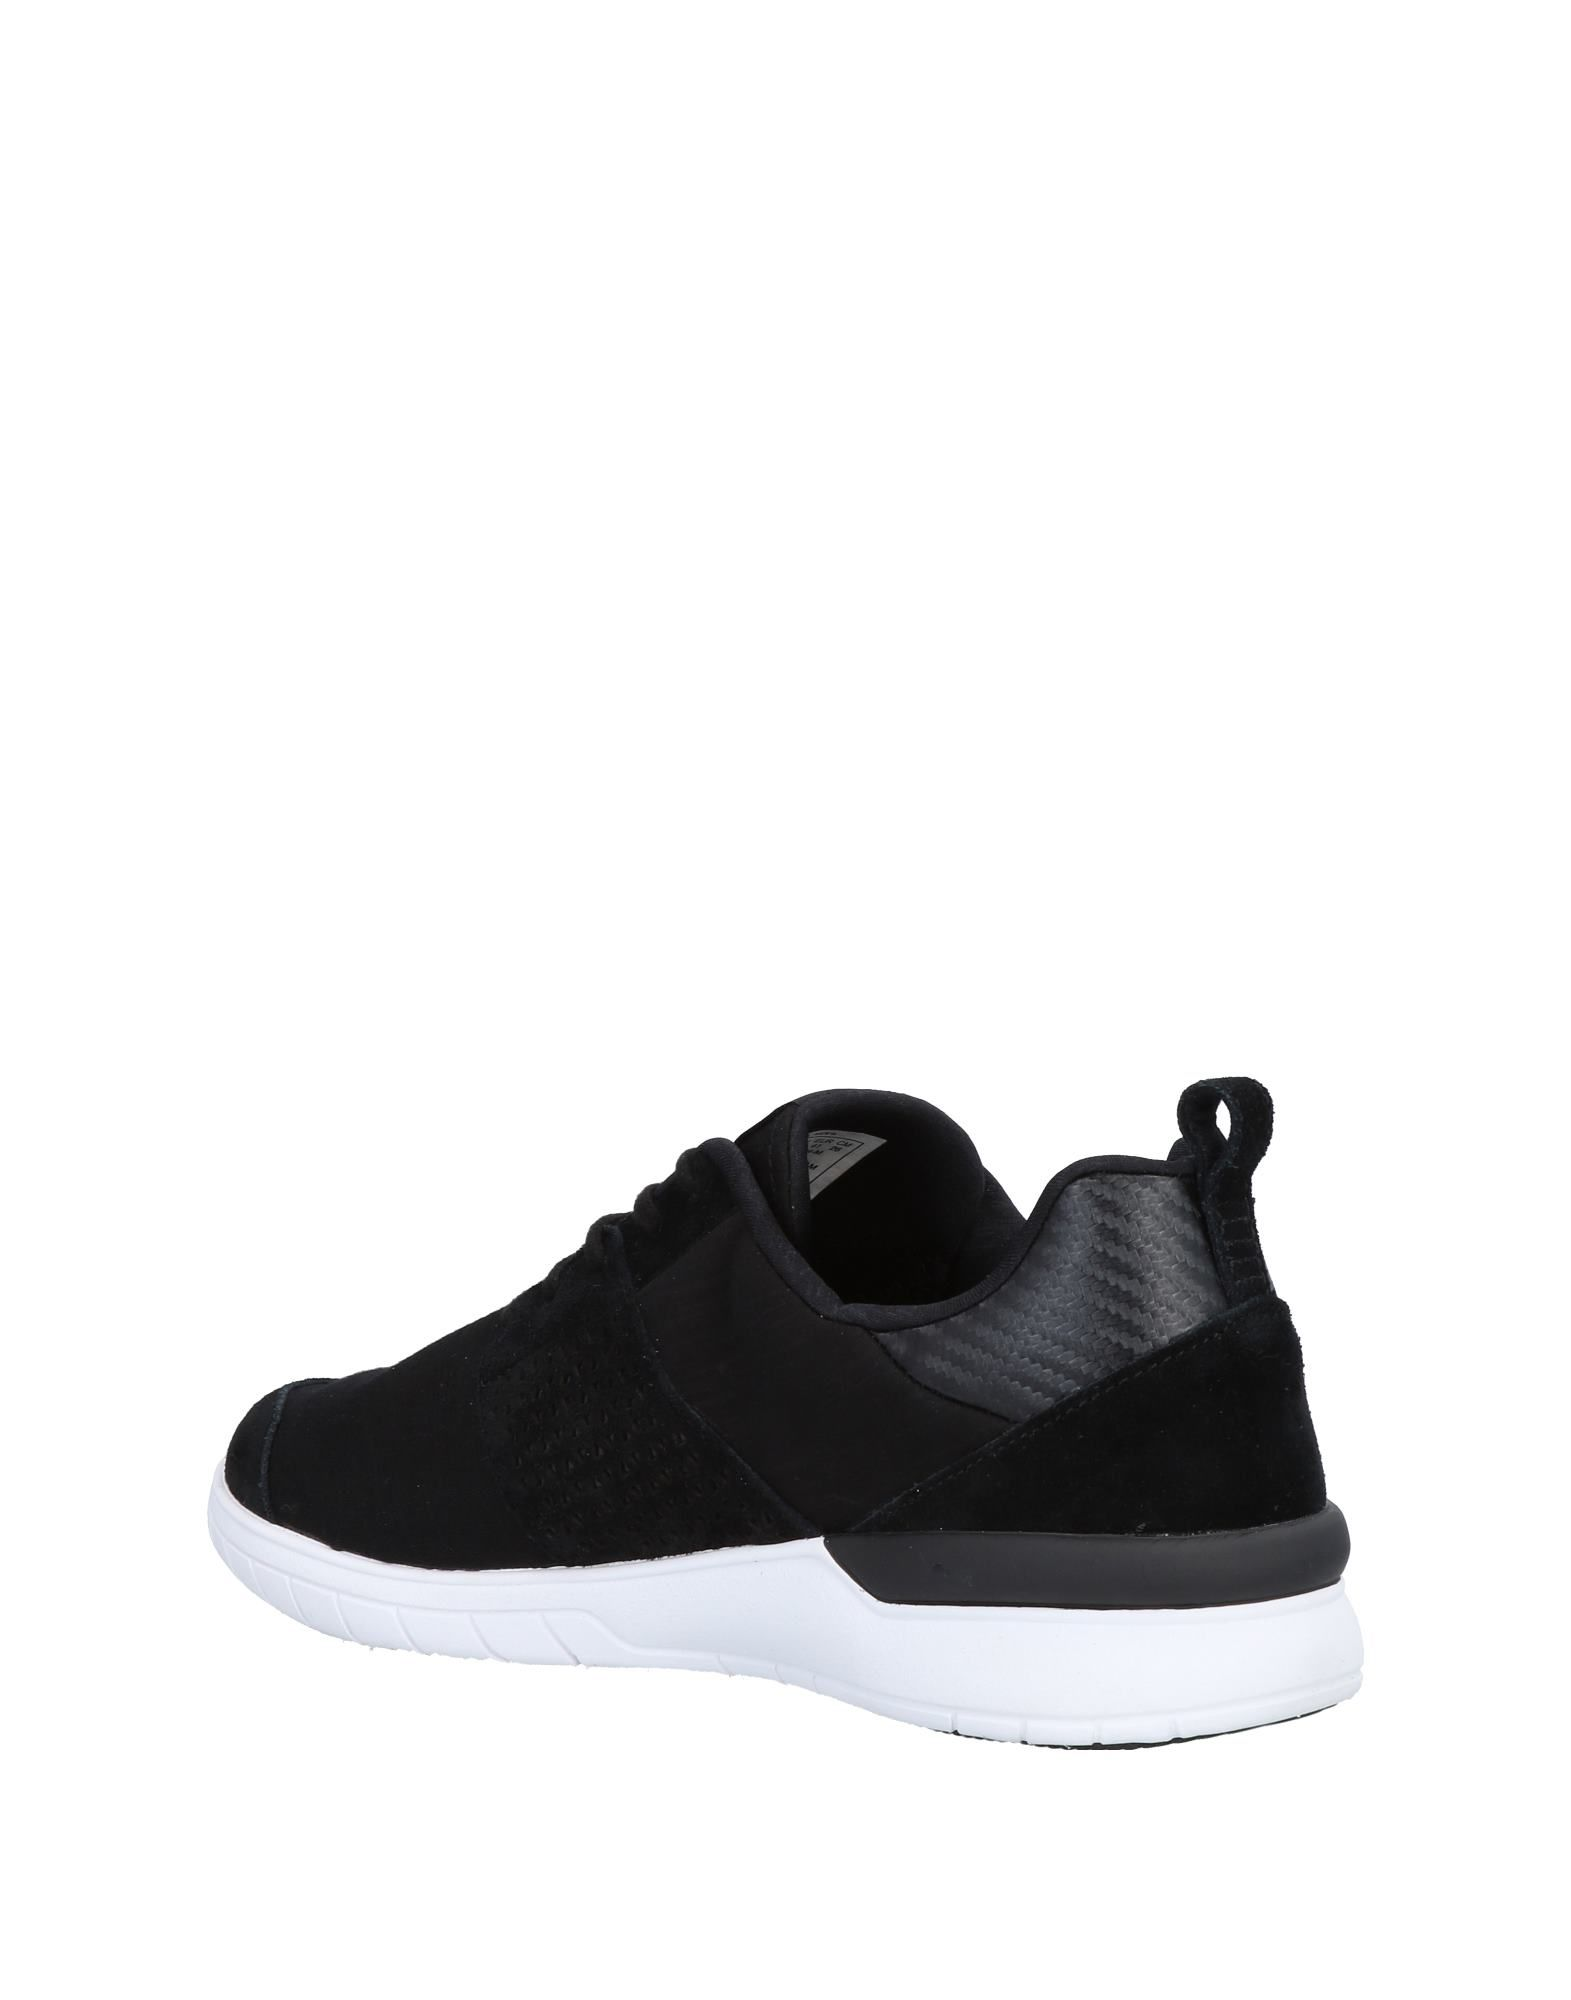 Moda Sneakers Supra Uomo Uomo Supra - 11473761RA 25eced